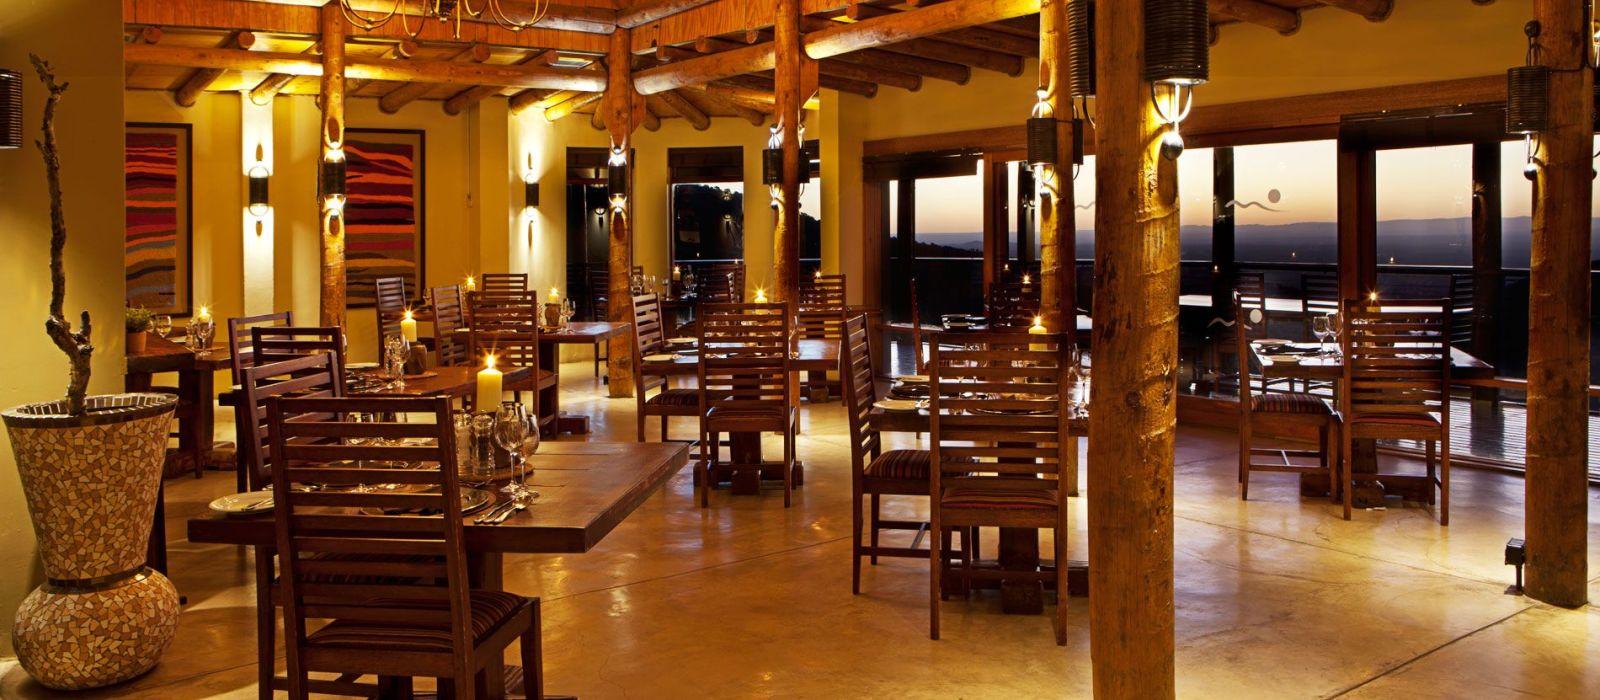 Hotel Kuzuko Lodge South Africa